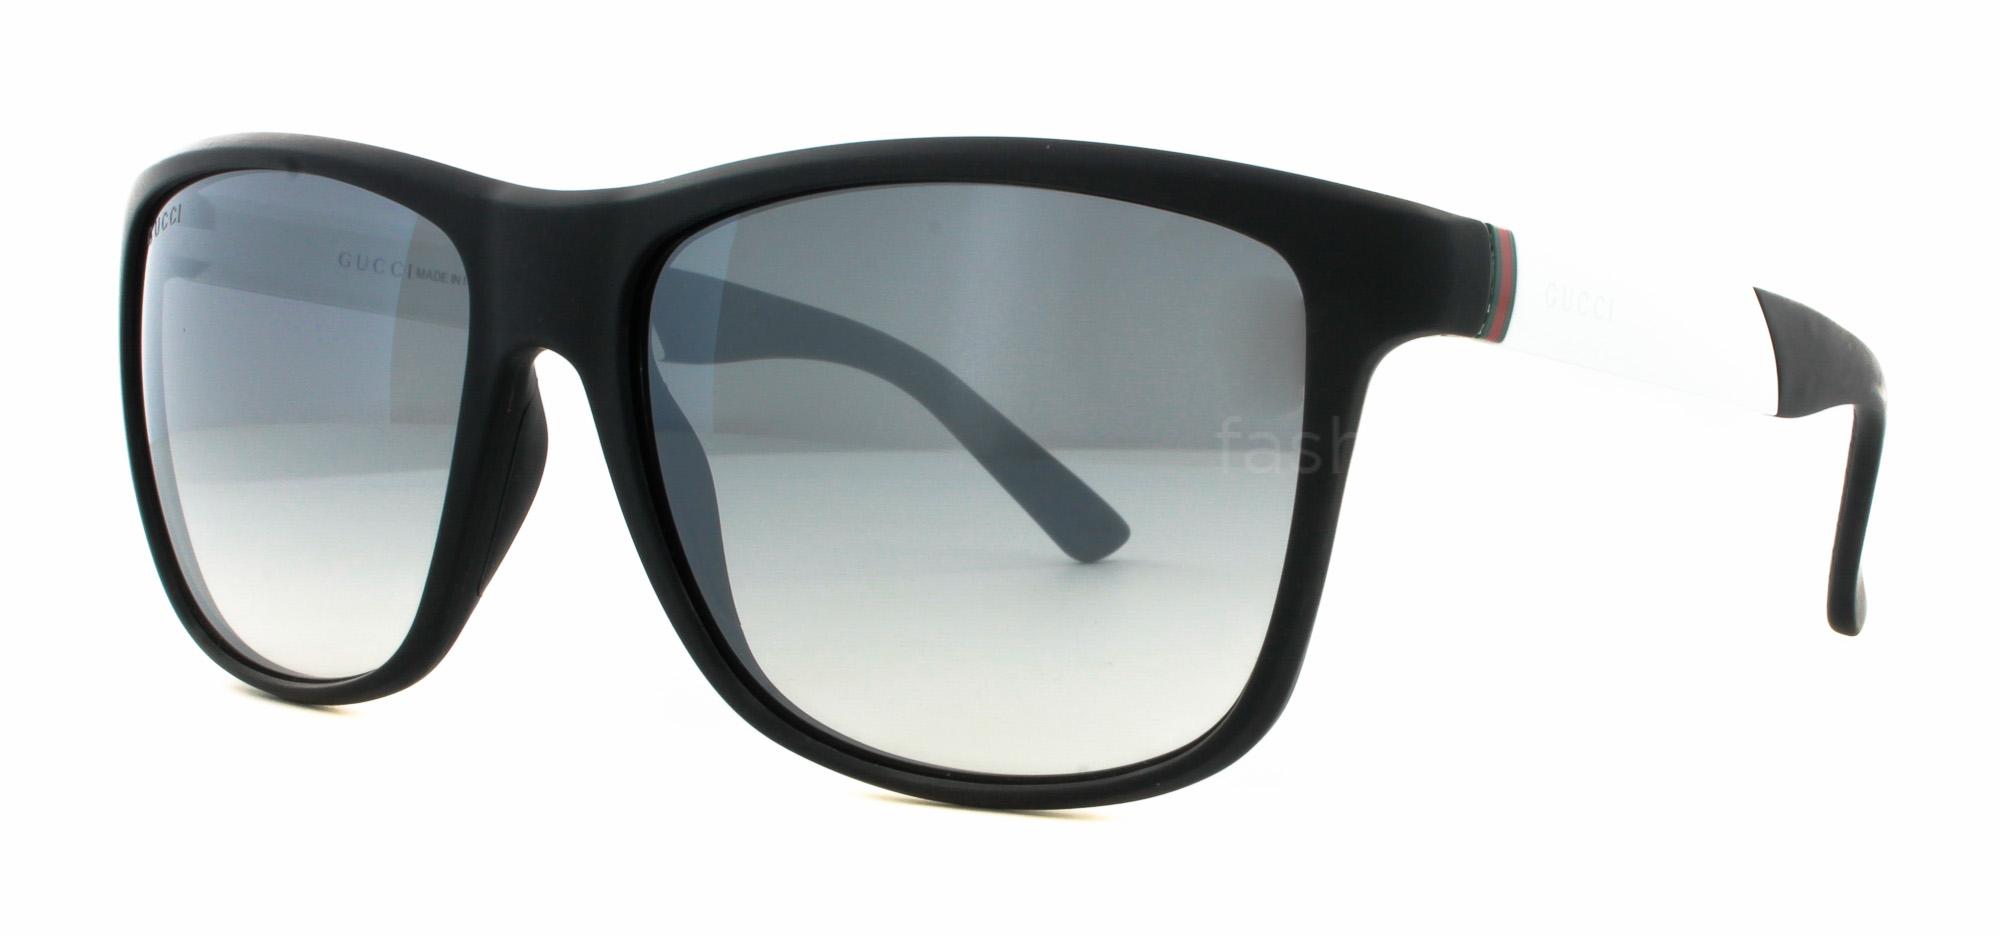 450ca7bc955 Gucci Sunglasses - Discount Designer Sunglasses